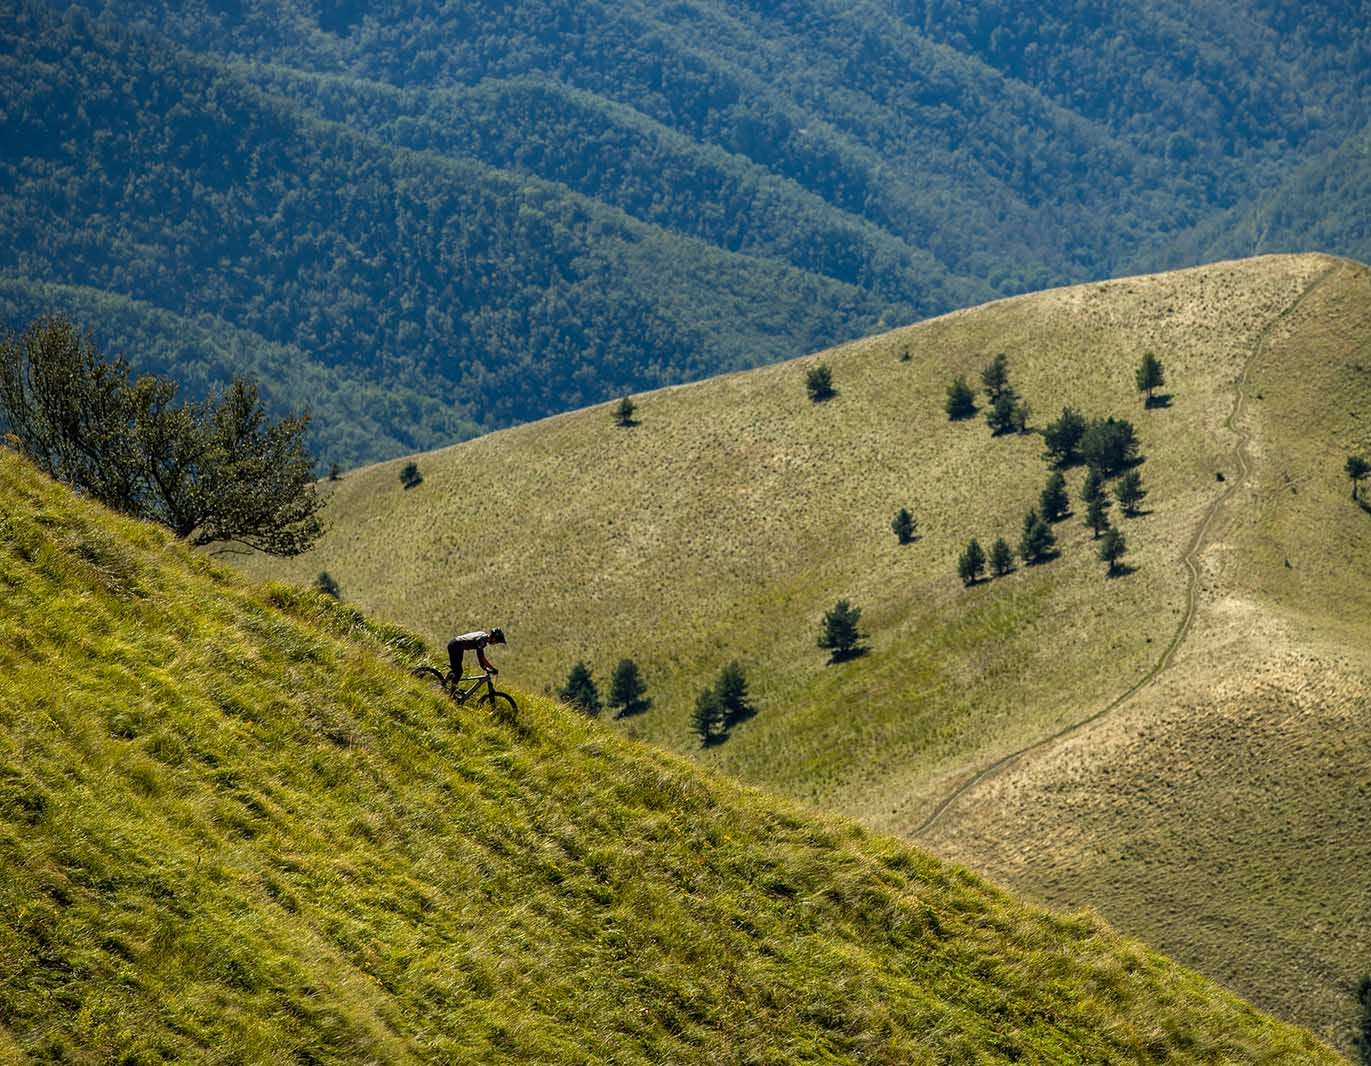 Mountain bike trail in the hills